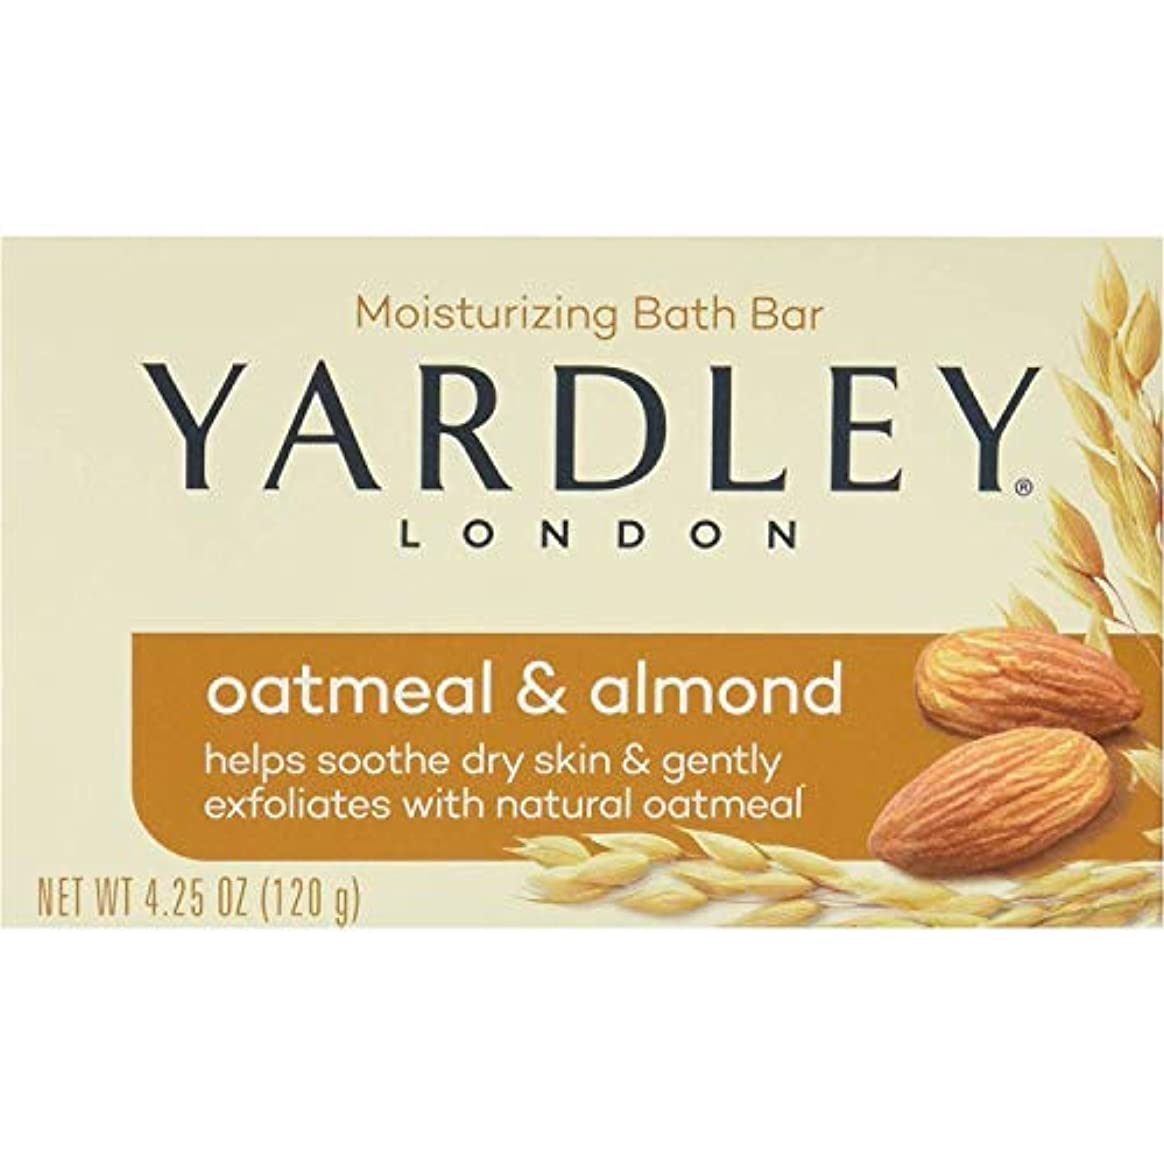 Yardley オートミールとアーモンド石鹸、4.25オズ。 20本のバー